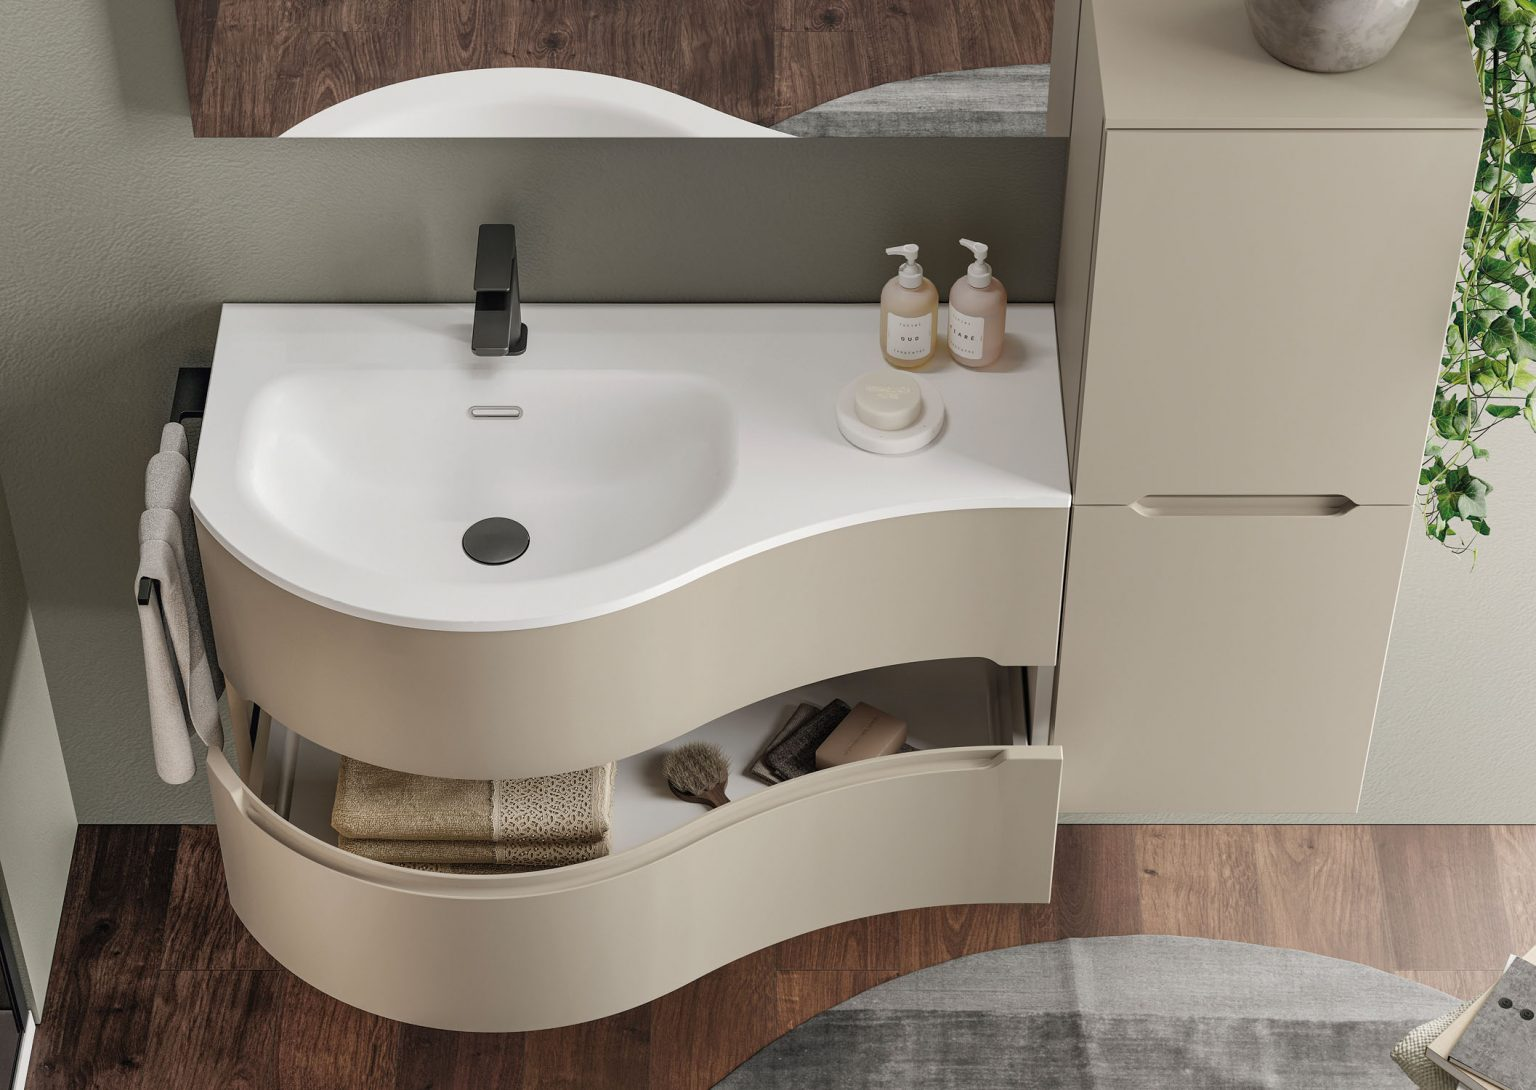 smyle-comp-06-lavabo-ideagroup-1536x1090